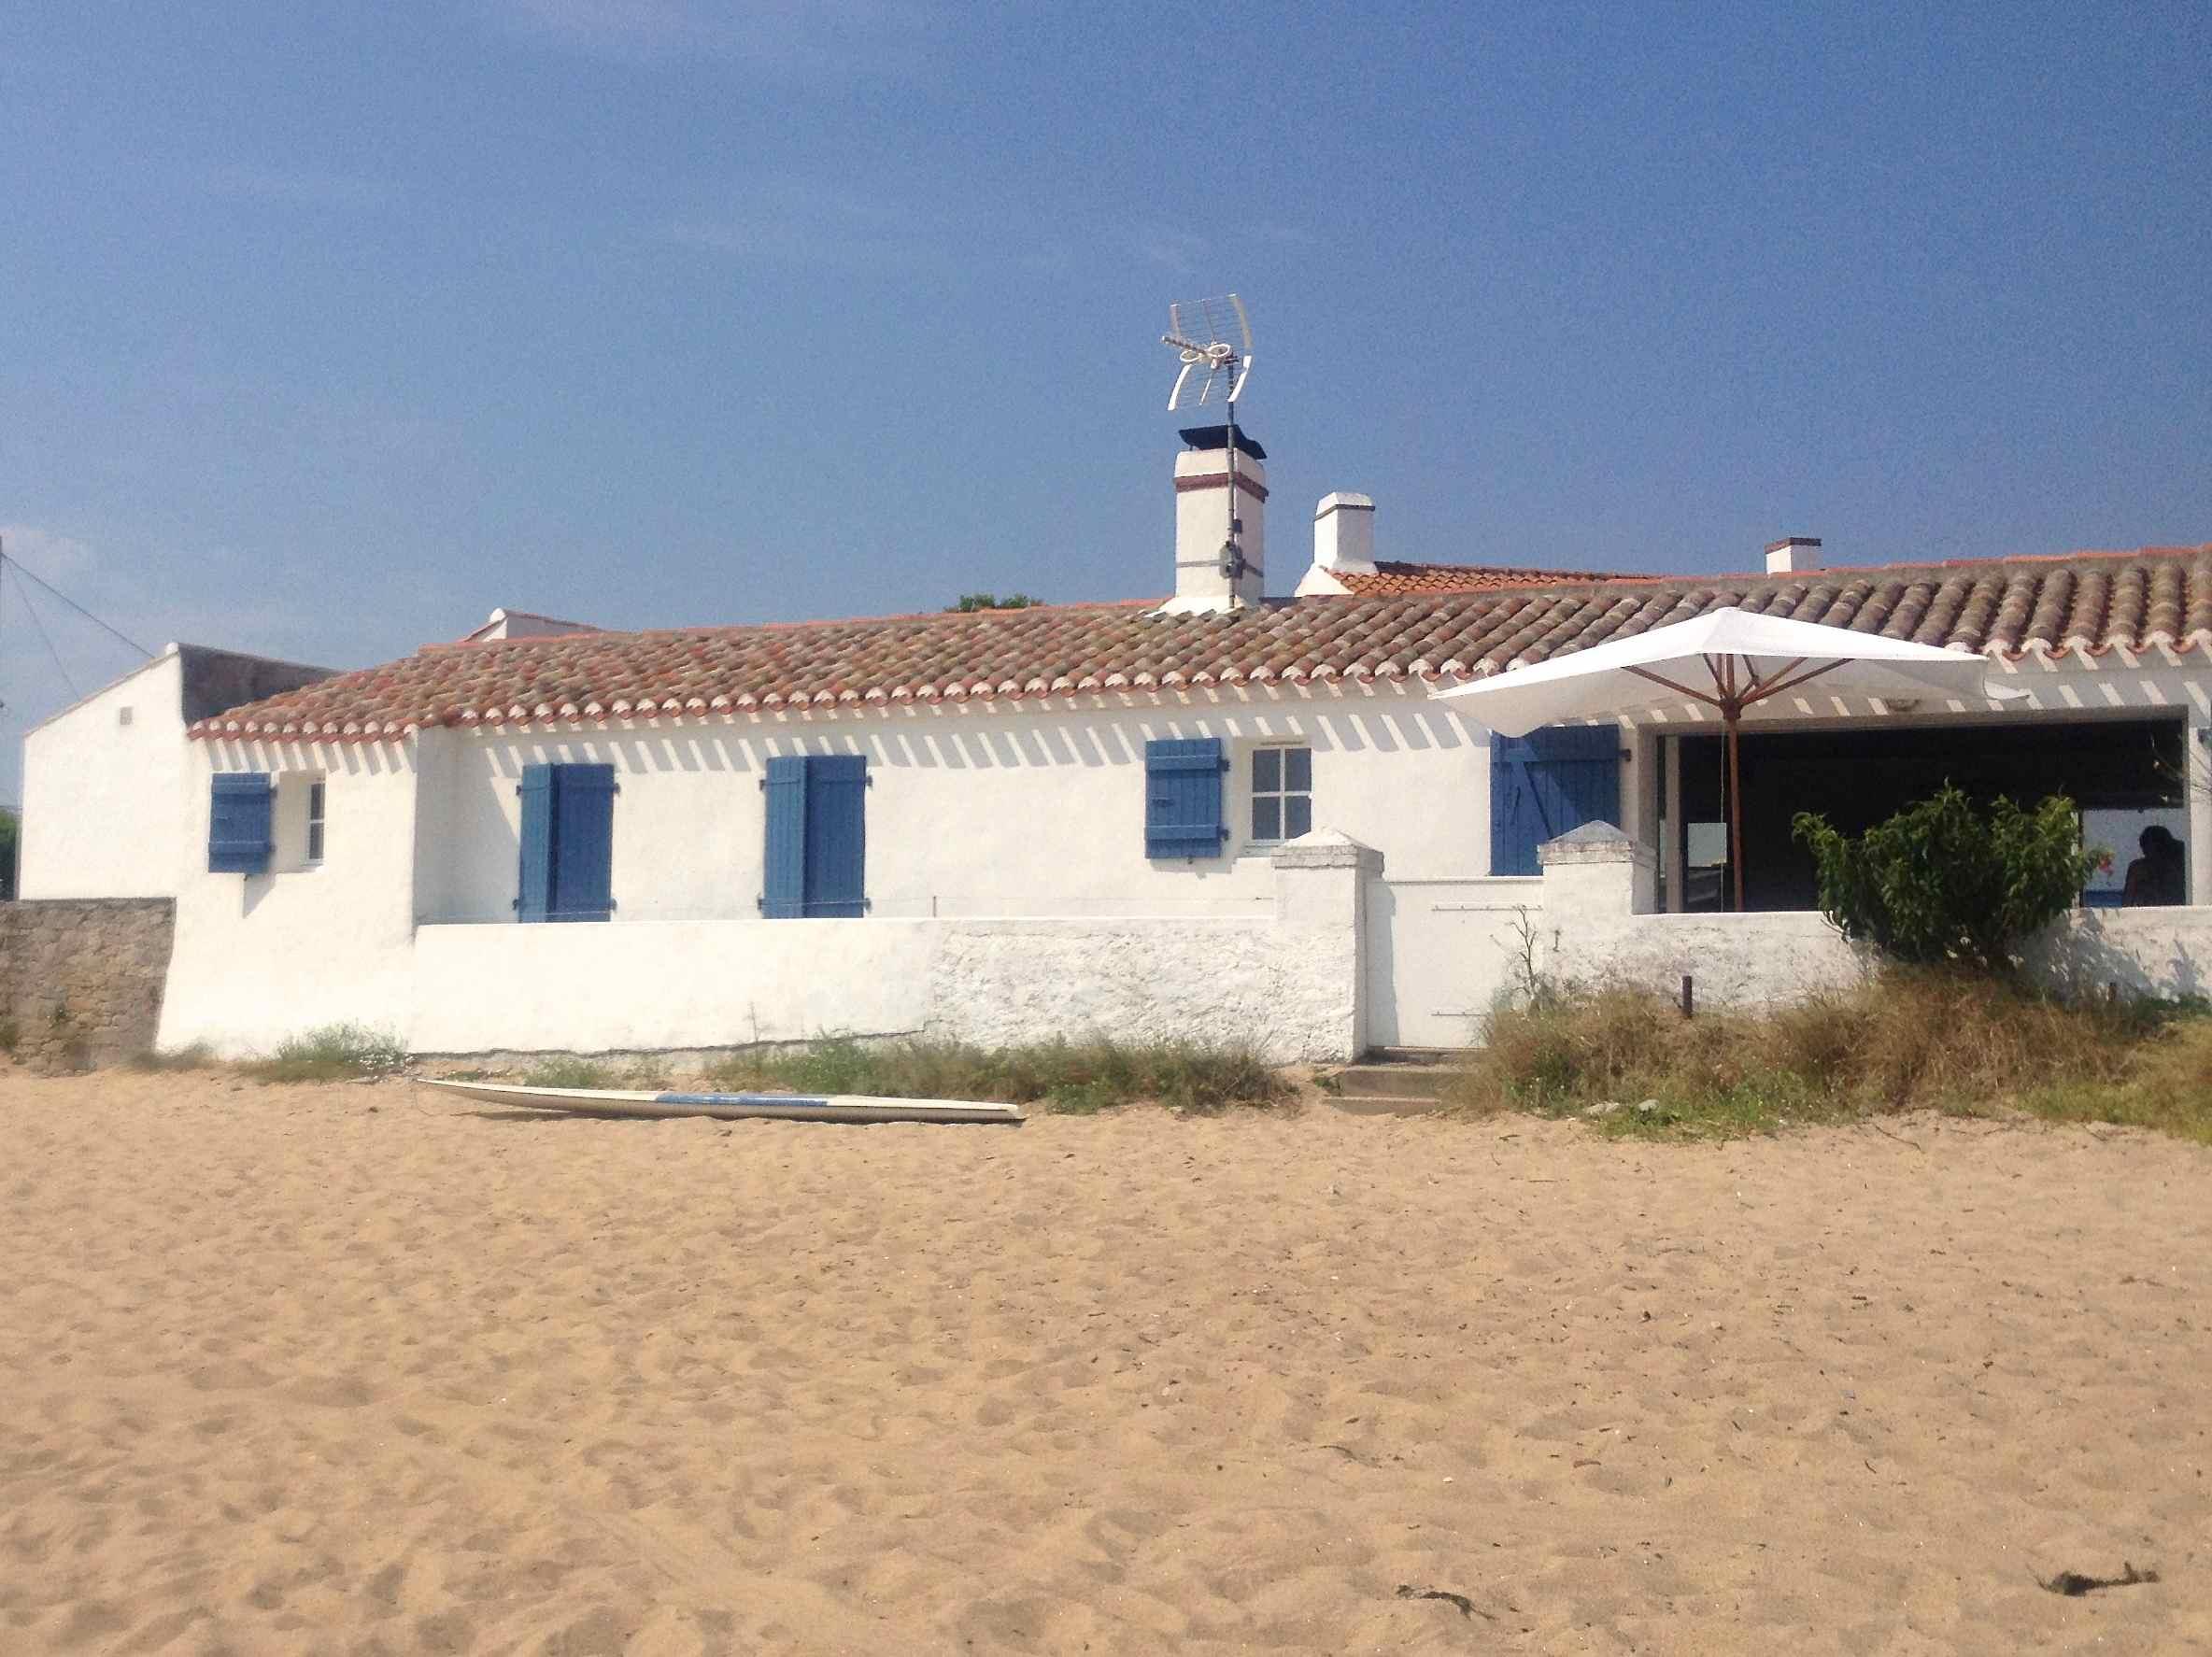 Noirmoutier, Le Vieil, beach and house on the beach